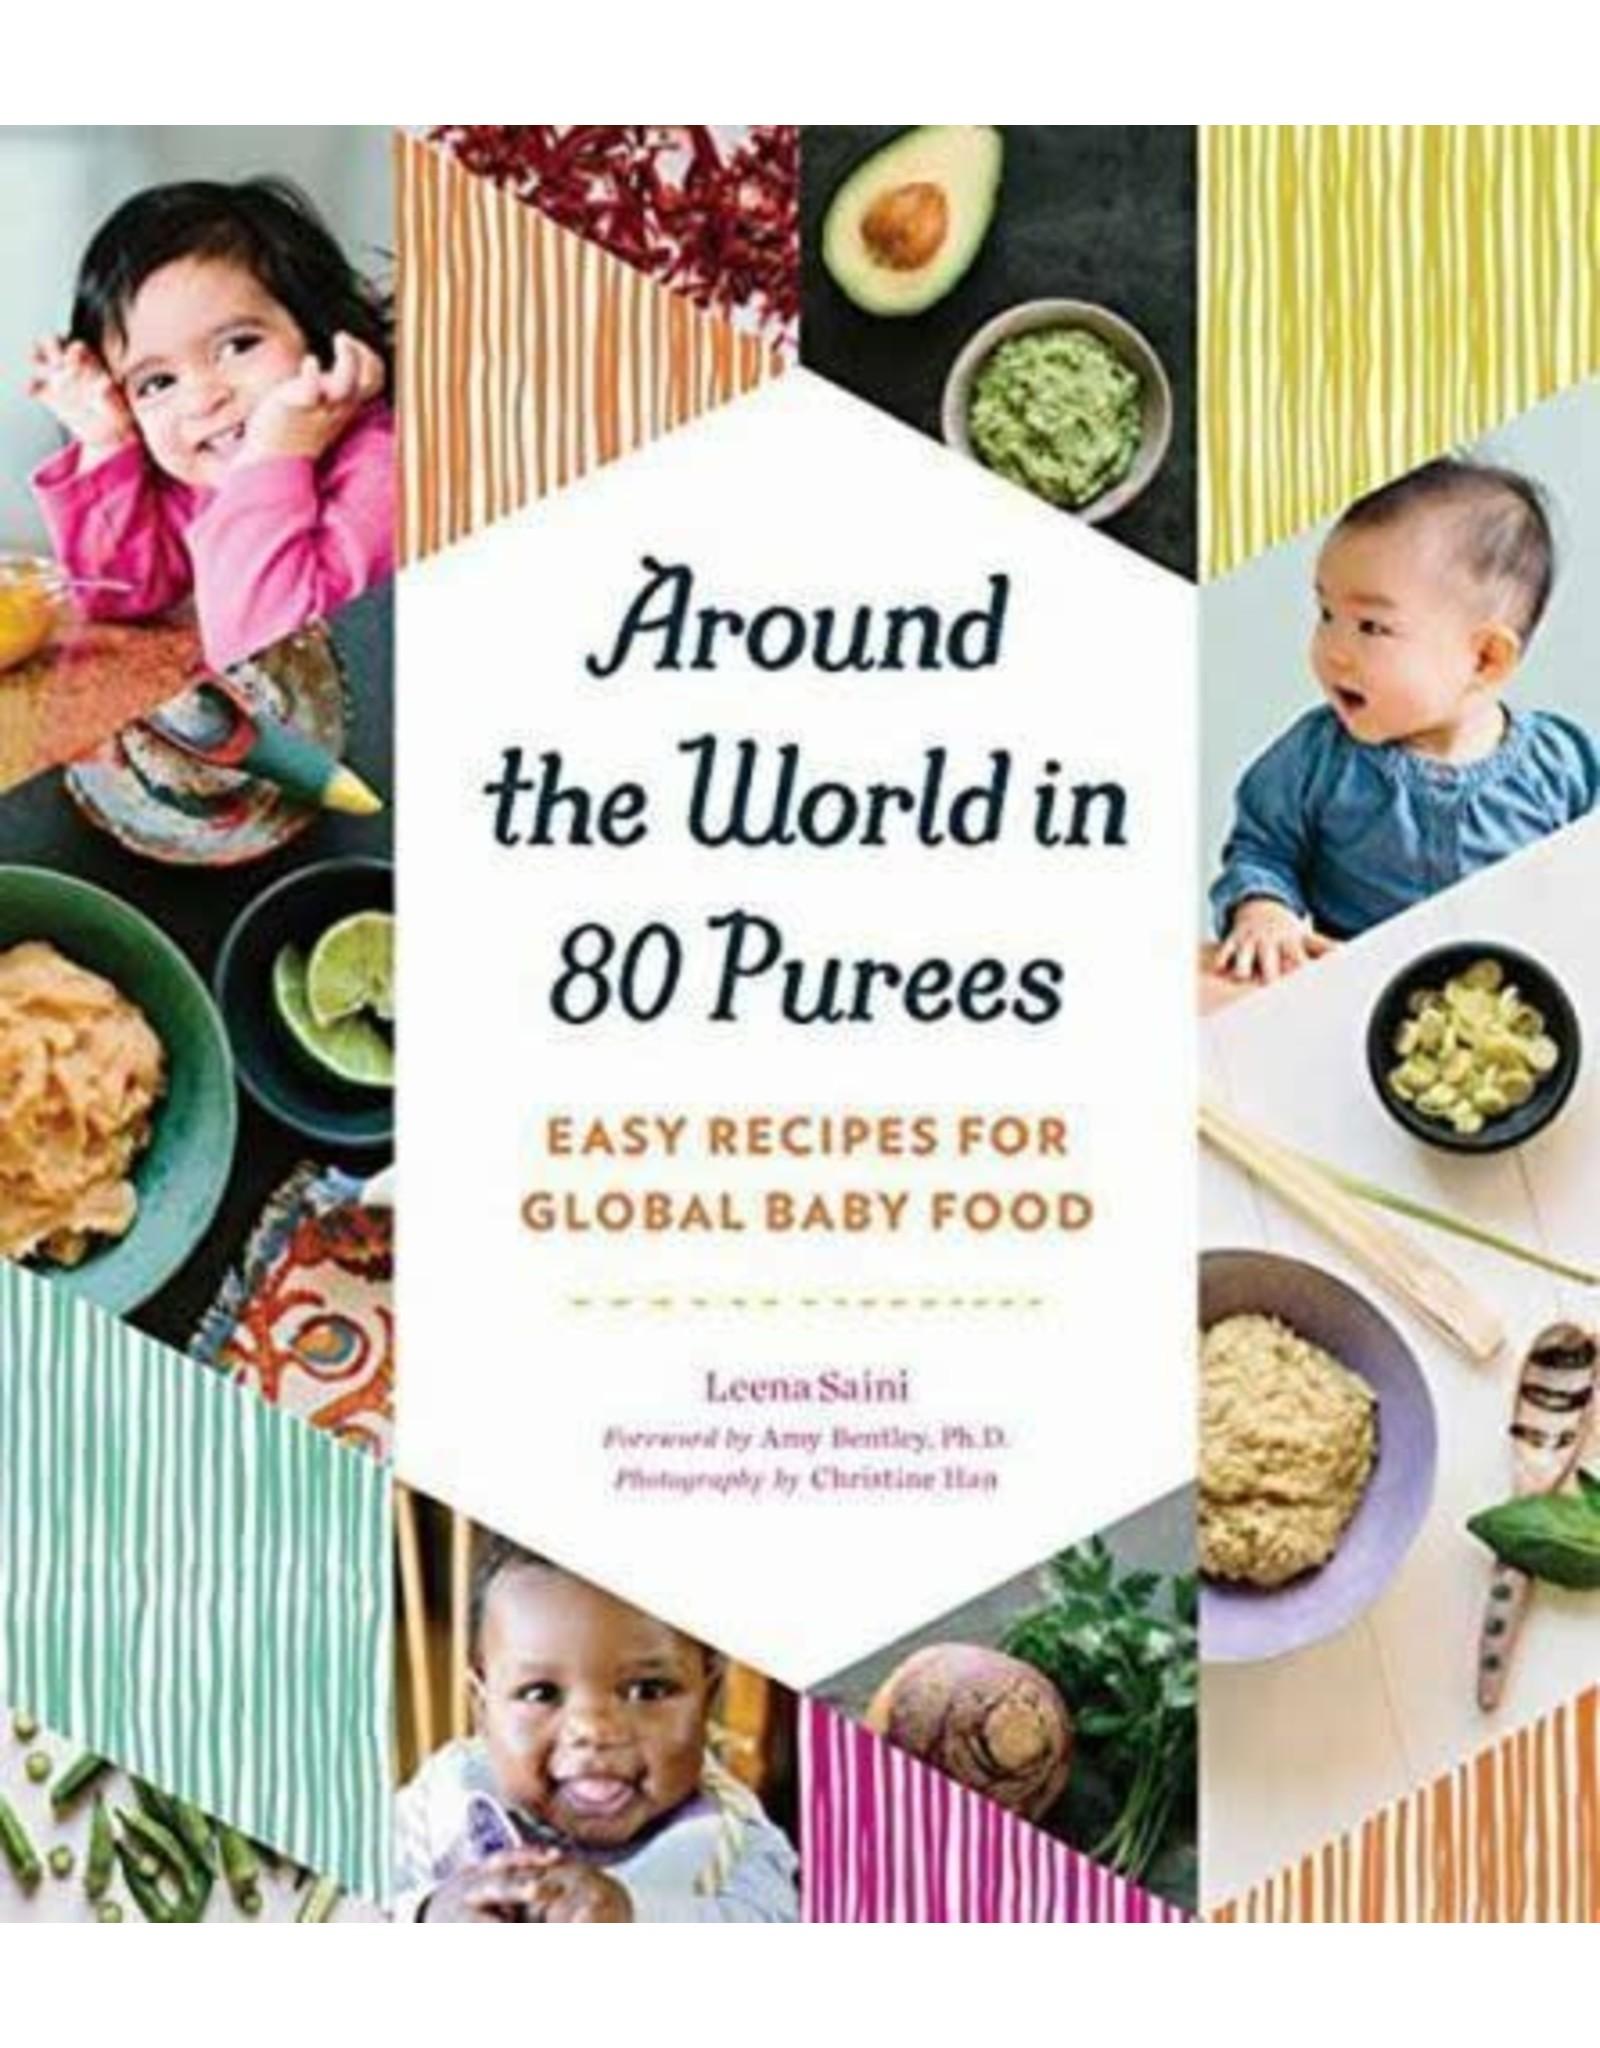 Around the World in 80 Purees